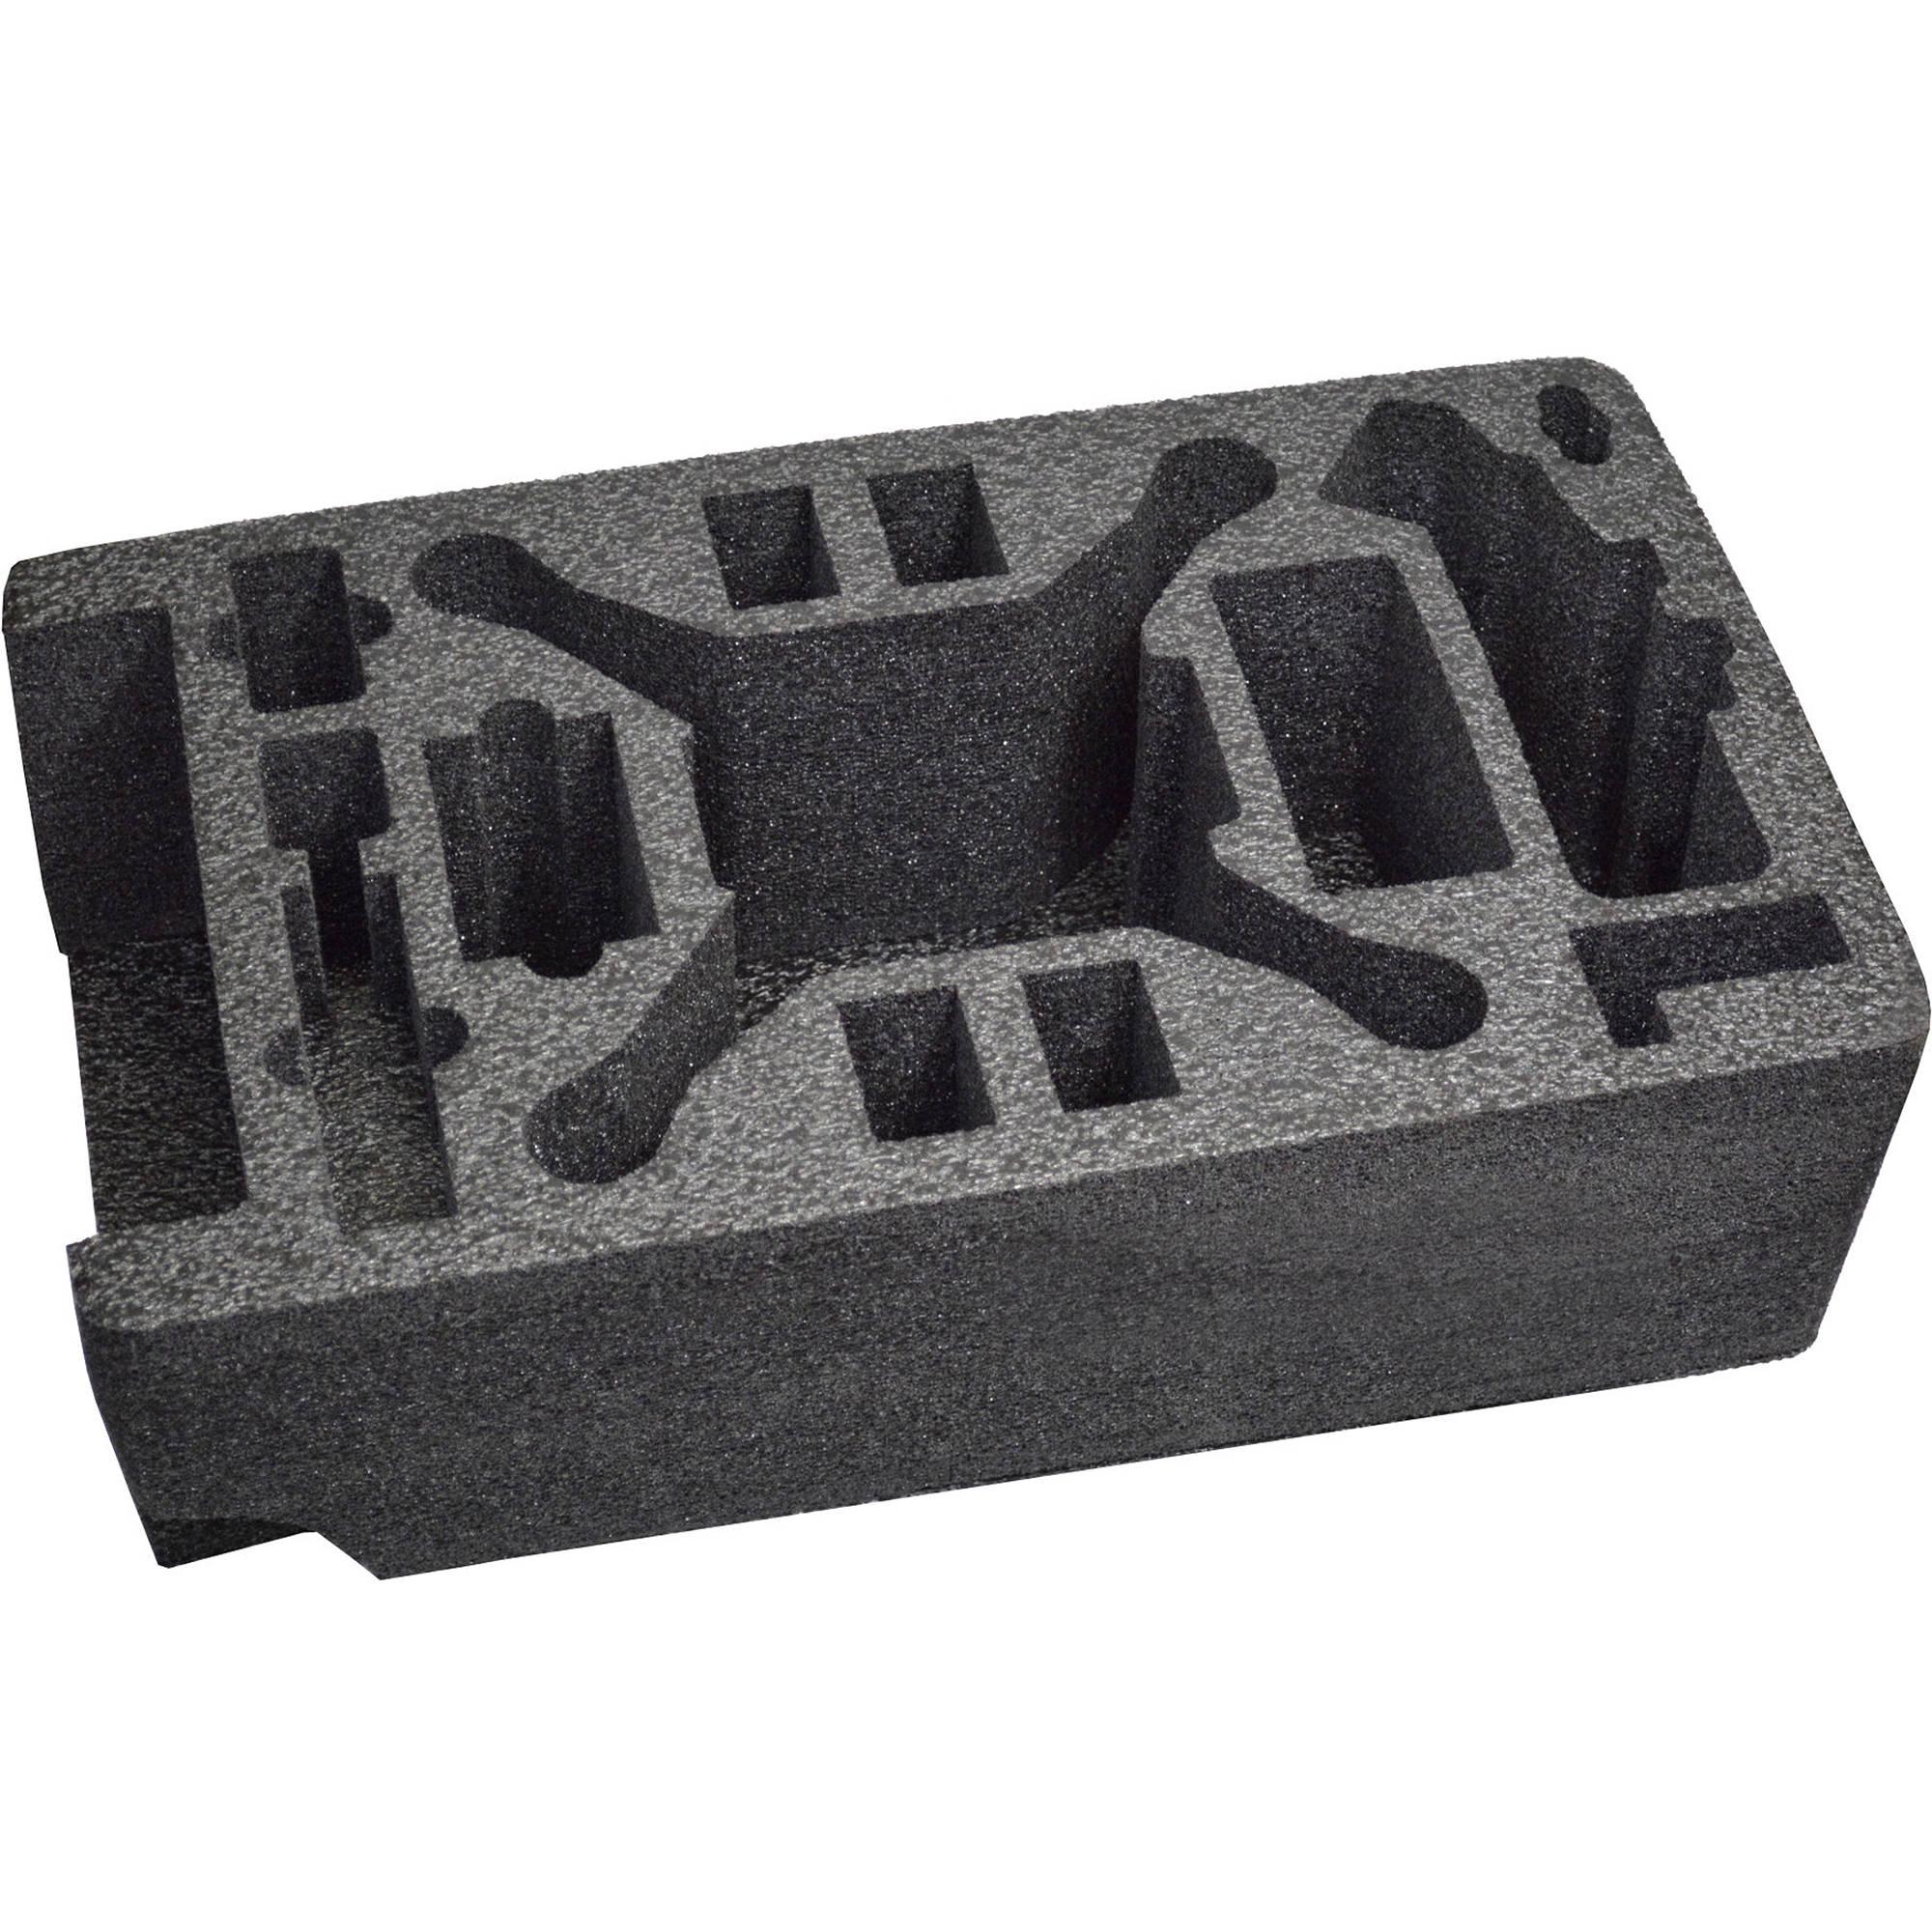 MyCaseBuilder DJI Phantom II/Vision/Plus Custom Foam Insert for Seahorse  SE-920 Case